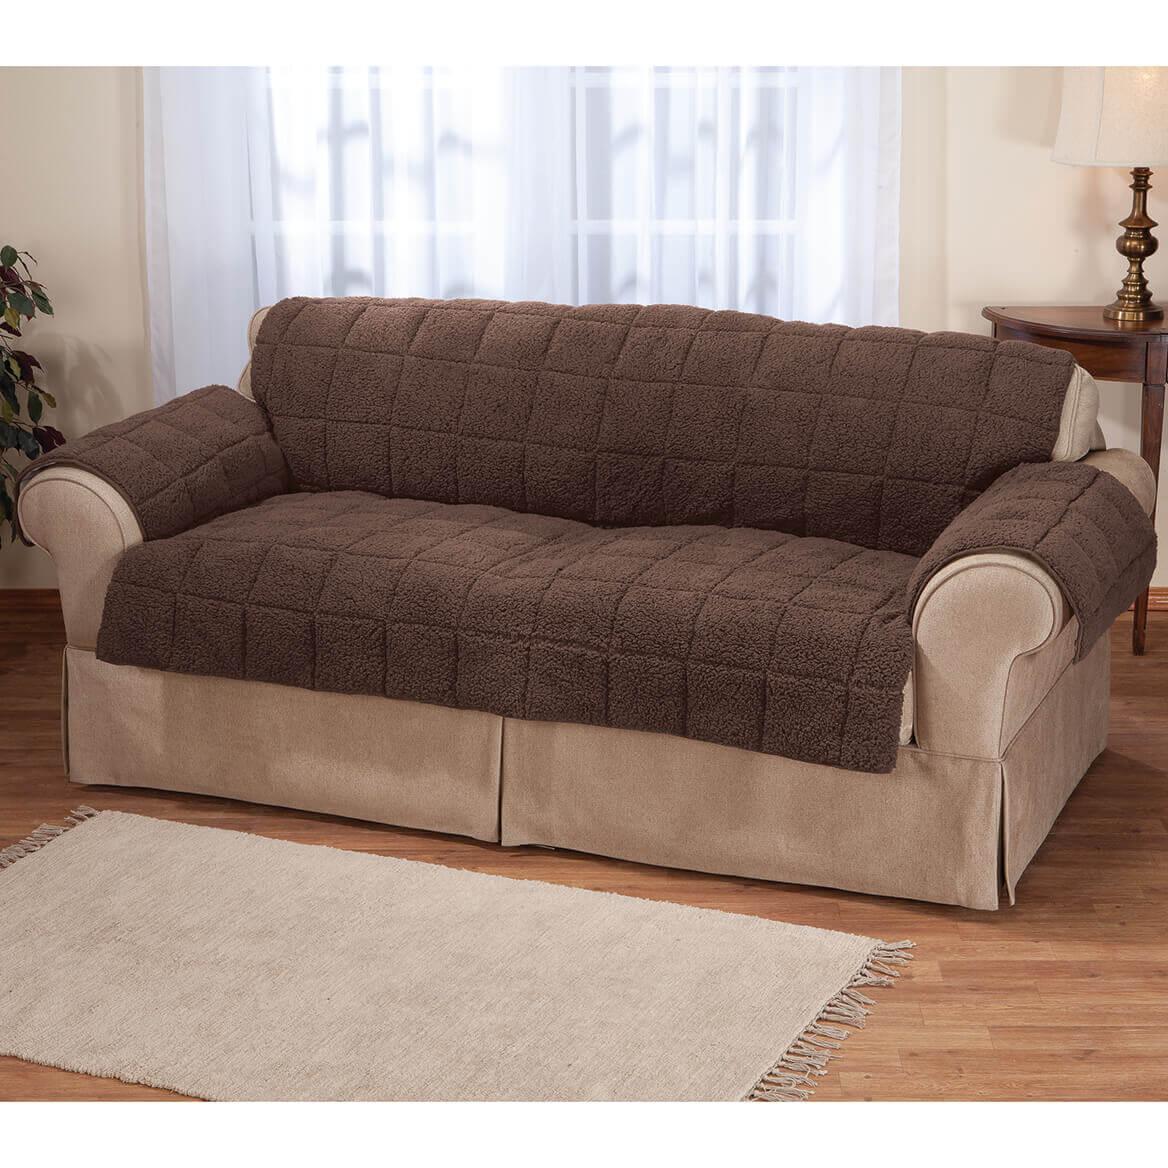 waterproof sofa protector craftsman style table plans sherpa by oakridge walter drake